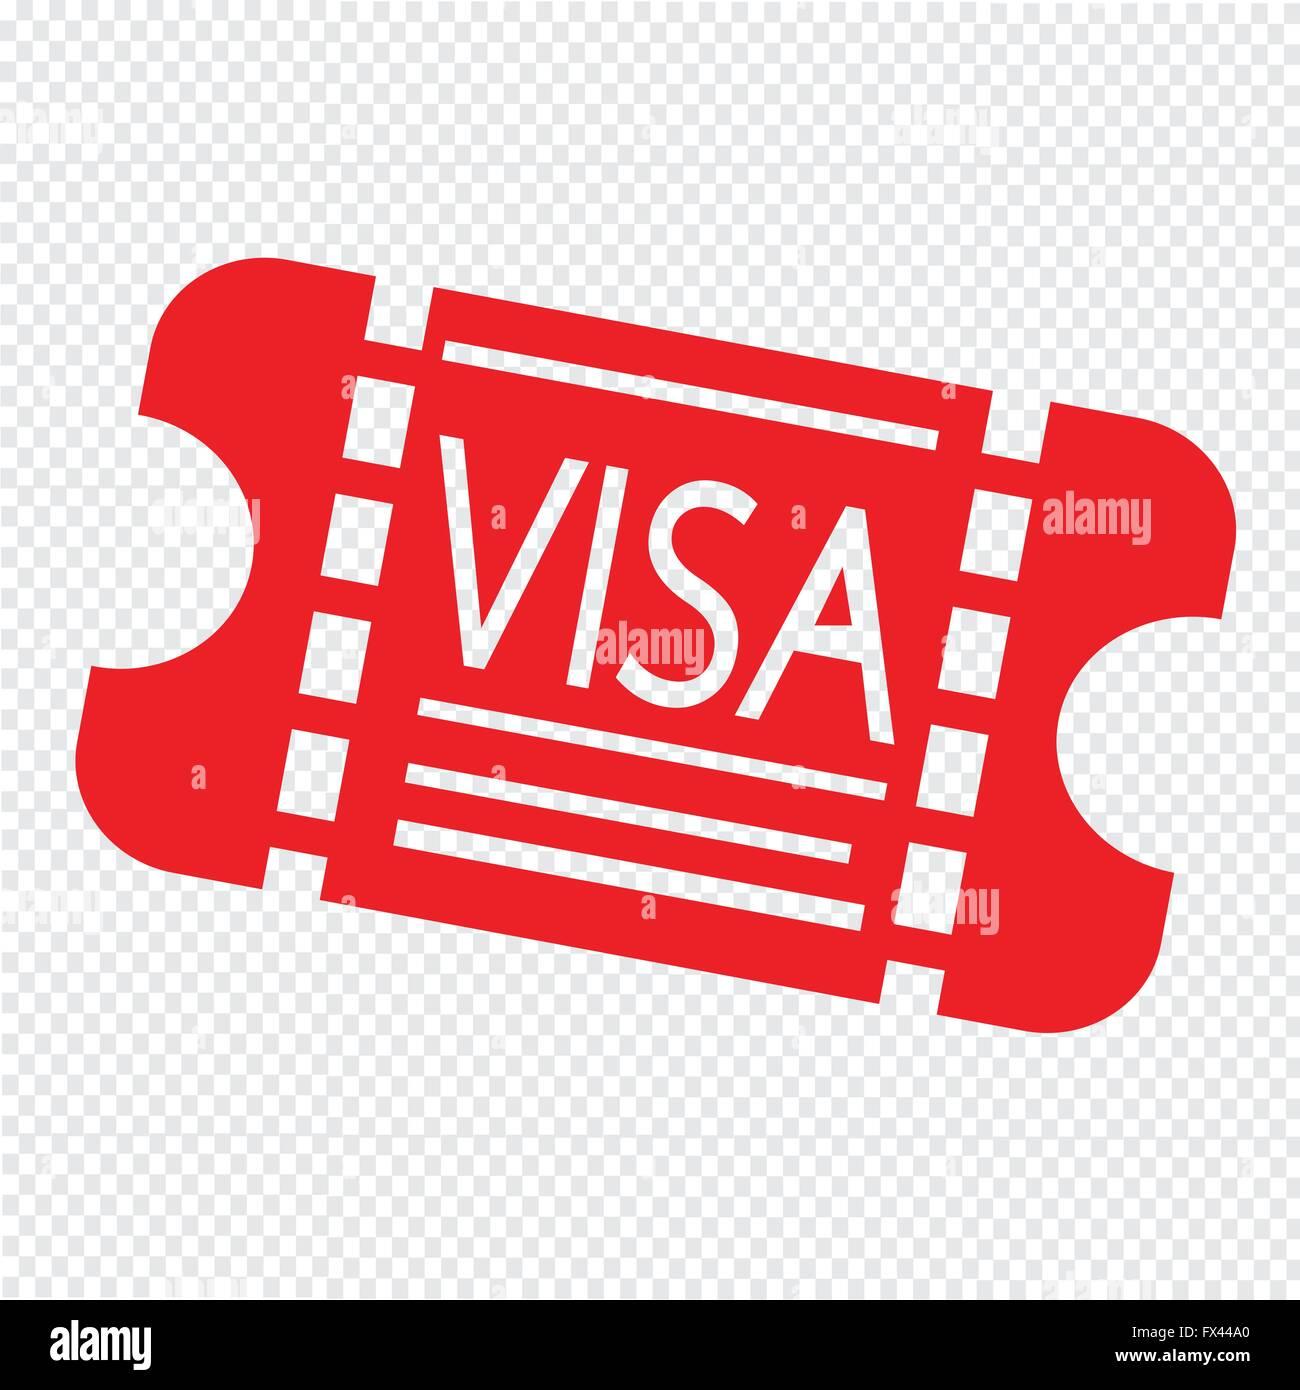 Entrance visa icon illustration design stock vector art entrance visa icon illustration design biocorpaavc Choice Image